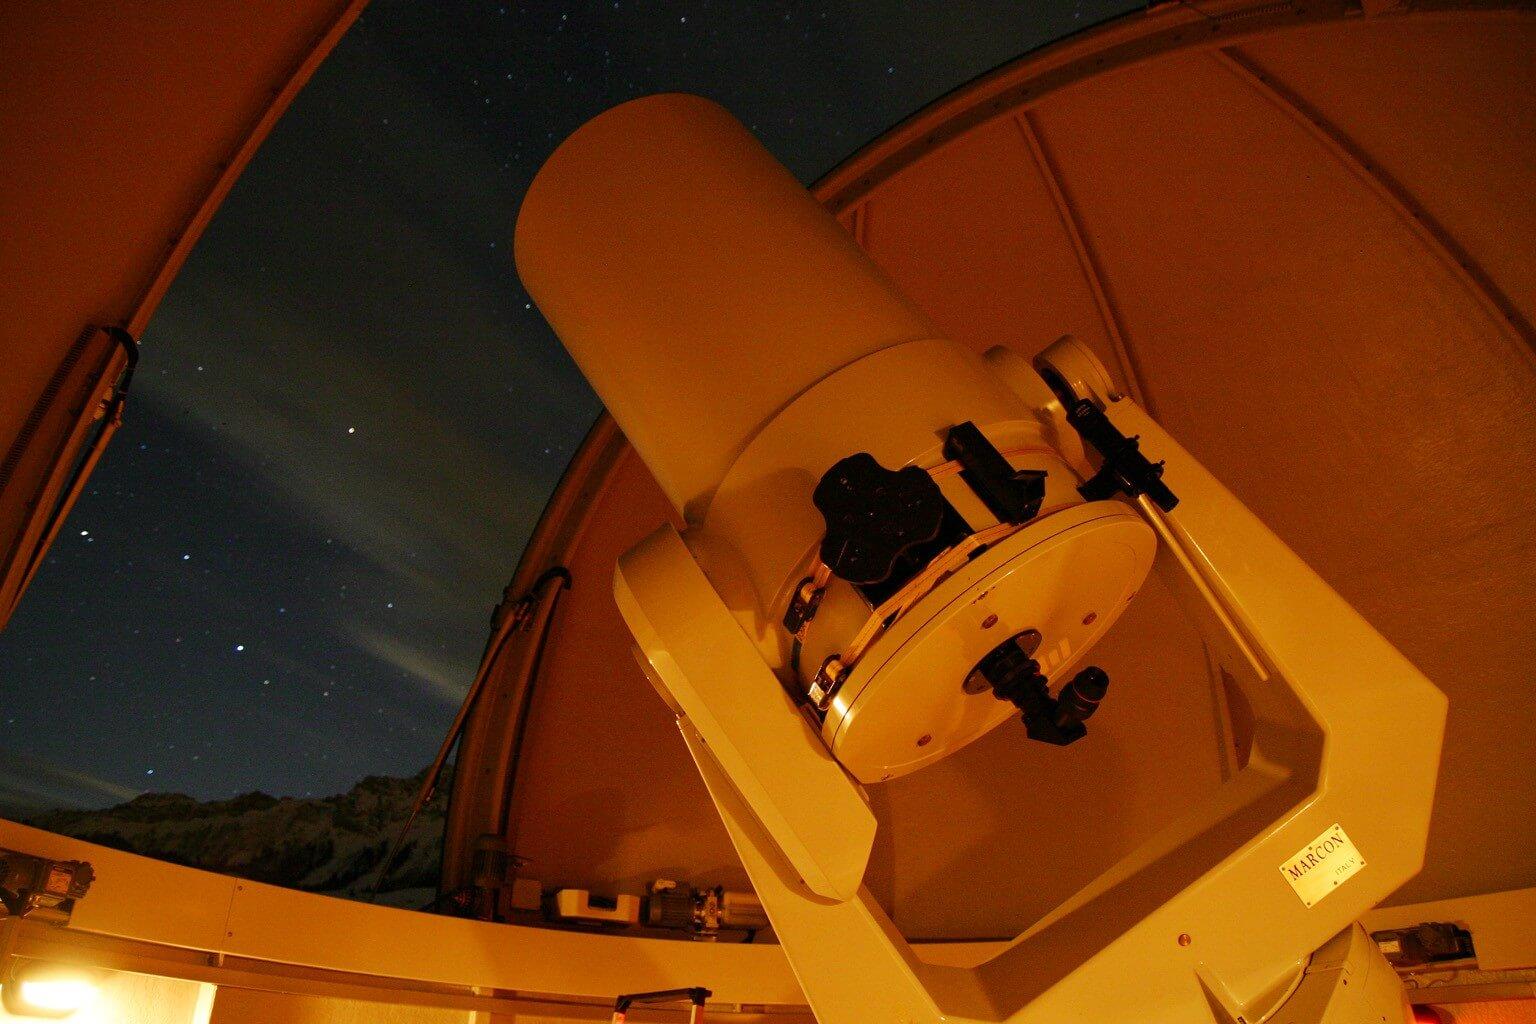 sigriswil-schwanden-sternwarte-sirius-teleskop-sternenhimmel